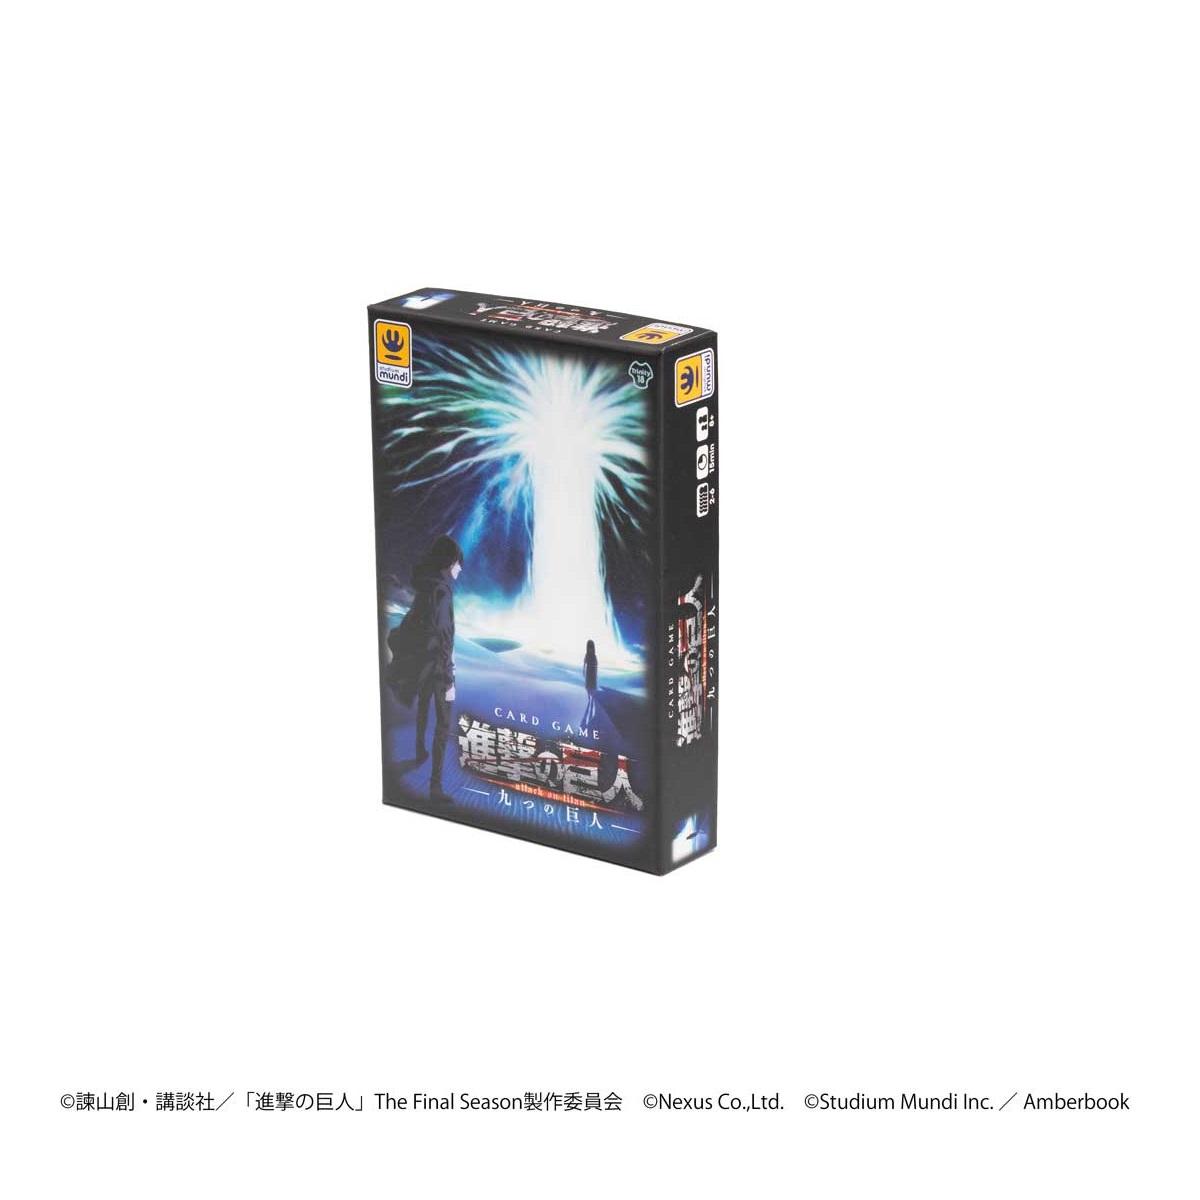 『進撃の巨人~九つの巨人~』11月20日発売決定!10月20日予約受付開始!